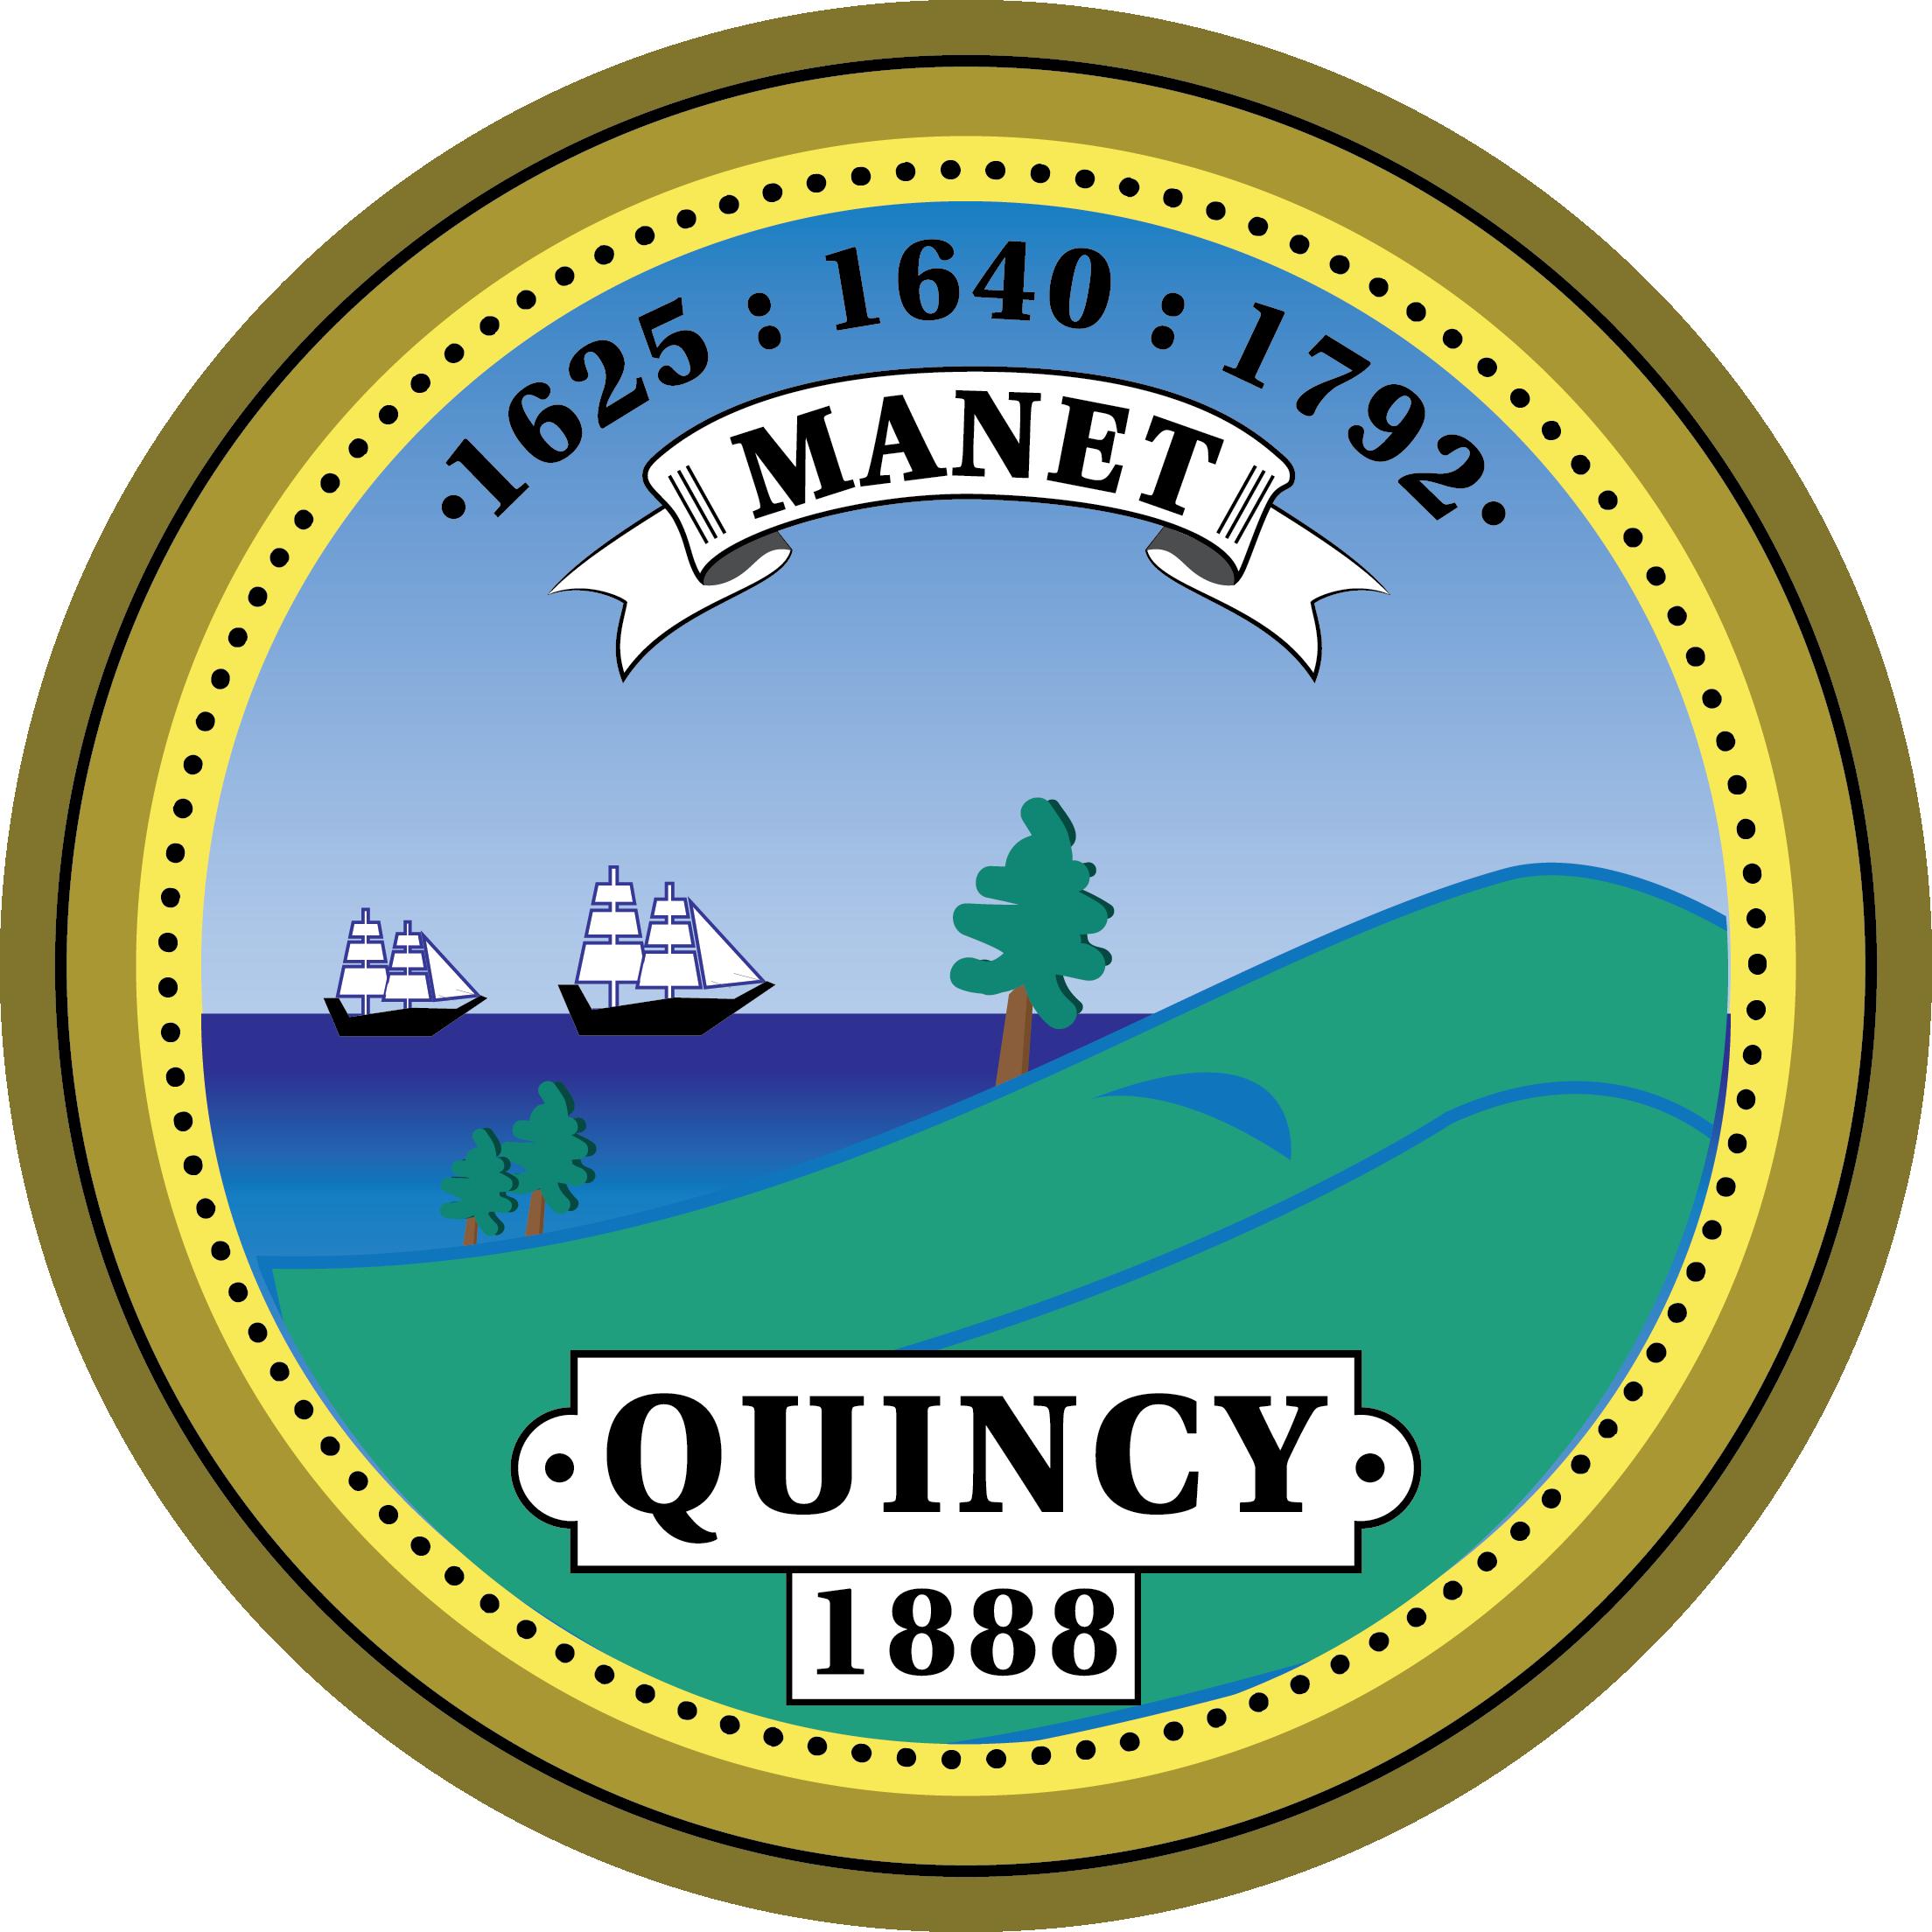 https://discoverquincy.com/wp-content/uploads/2021/06/CityofQuincySeal_ColorOutline_FINAL.png